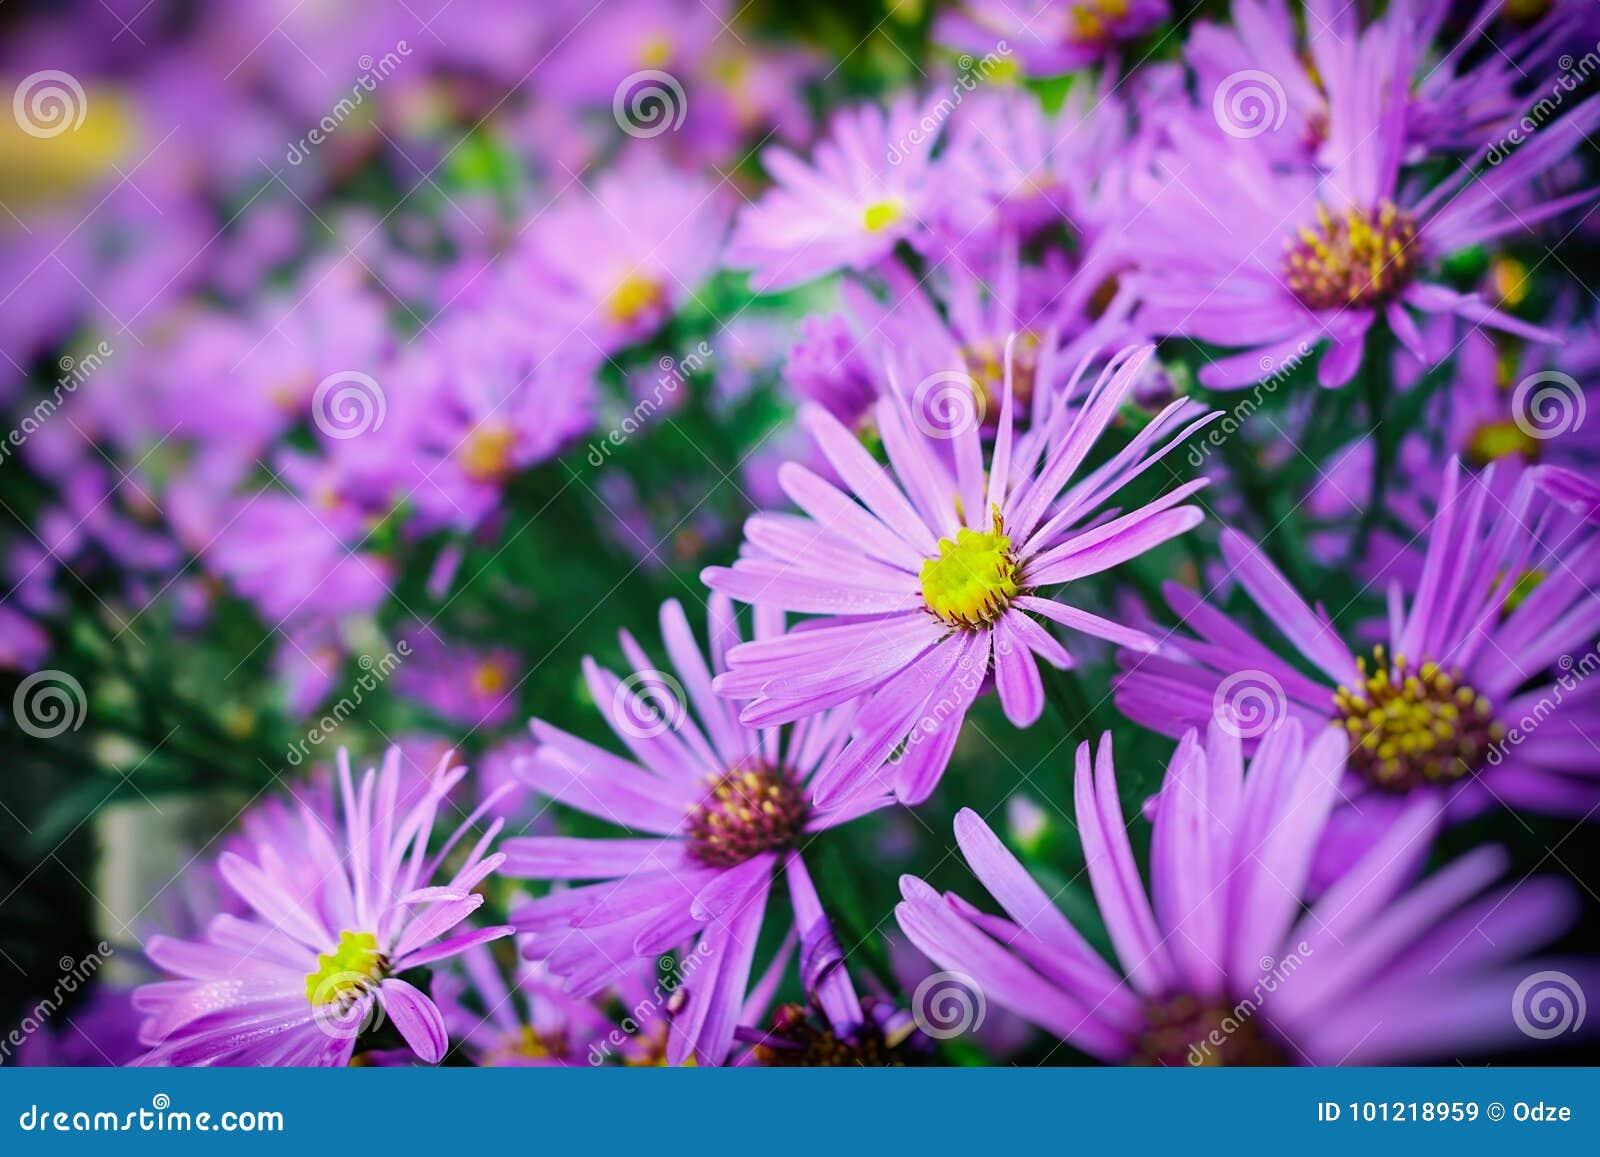 autumn chrysanthemum flowers stock image - image of blooming, lilac